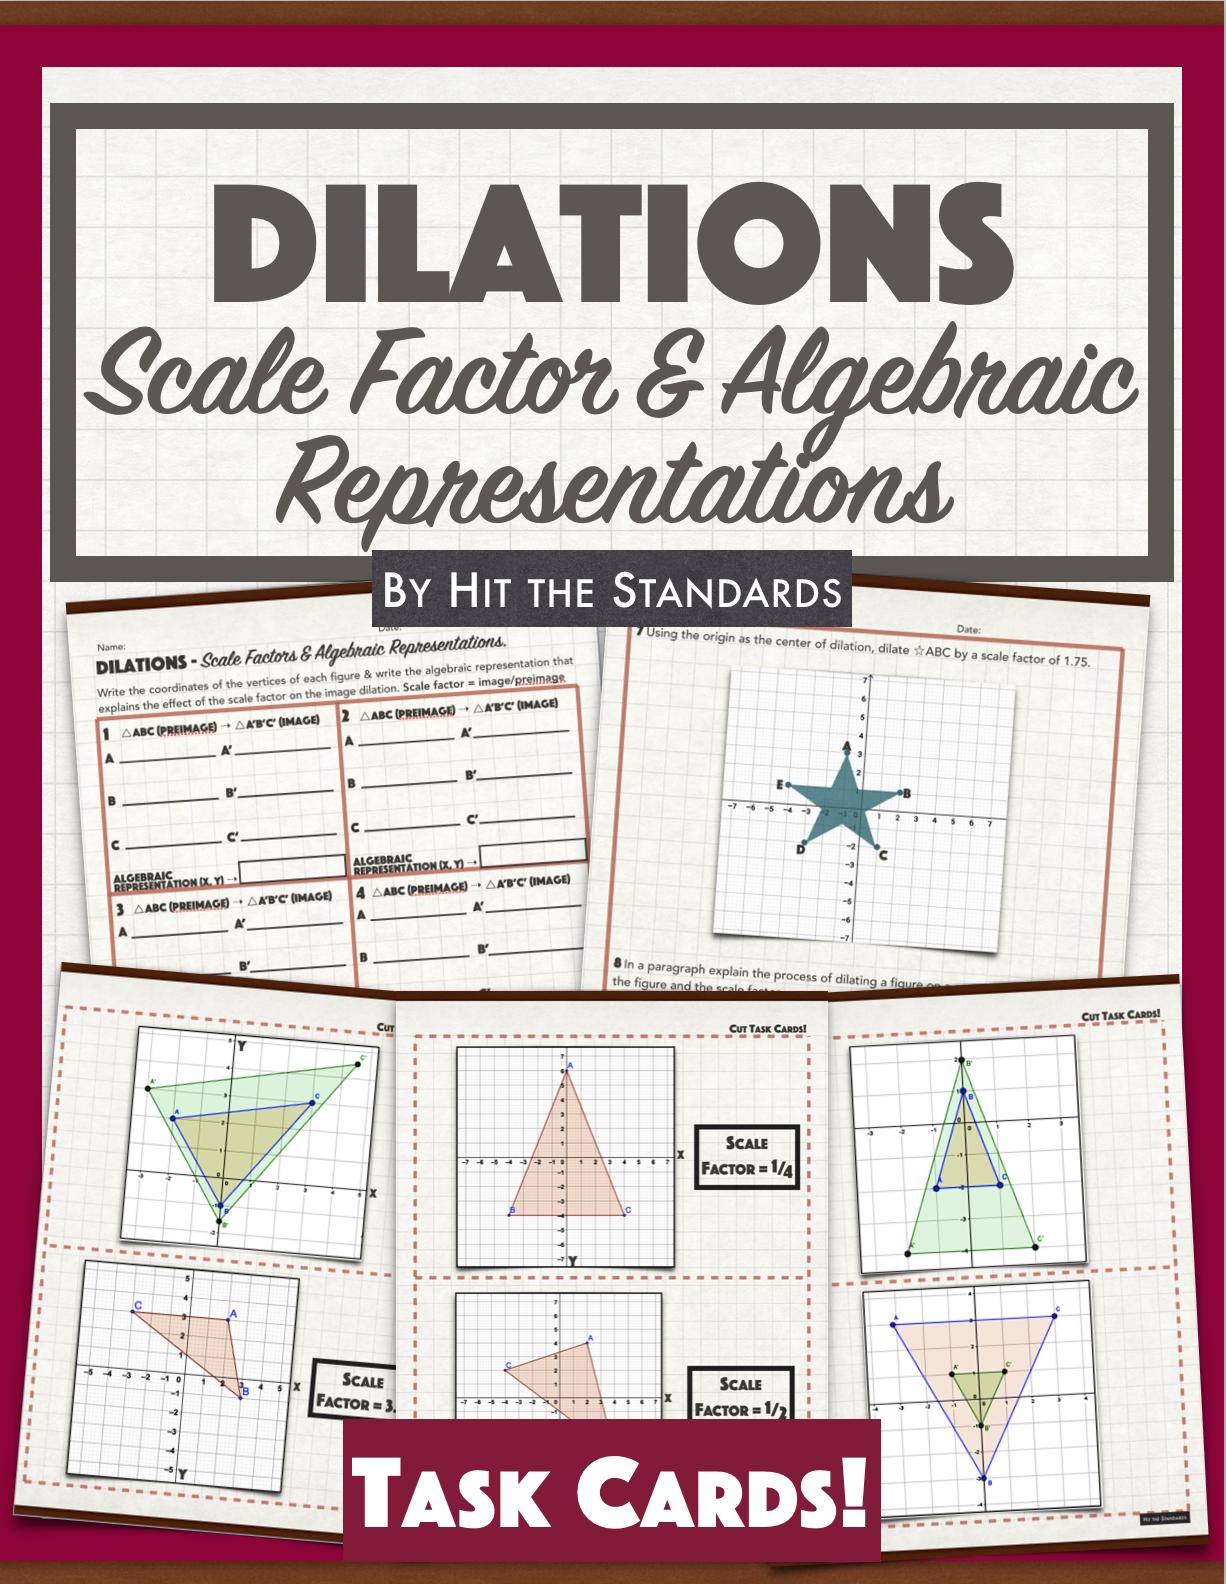 Transformations Dilation On Coordinate Plane Algebraic Representations Summer School Math Activities Fall Math Activities Winter Math Activities